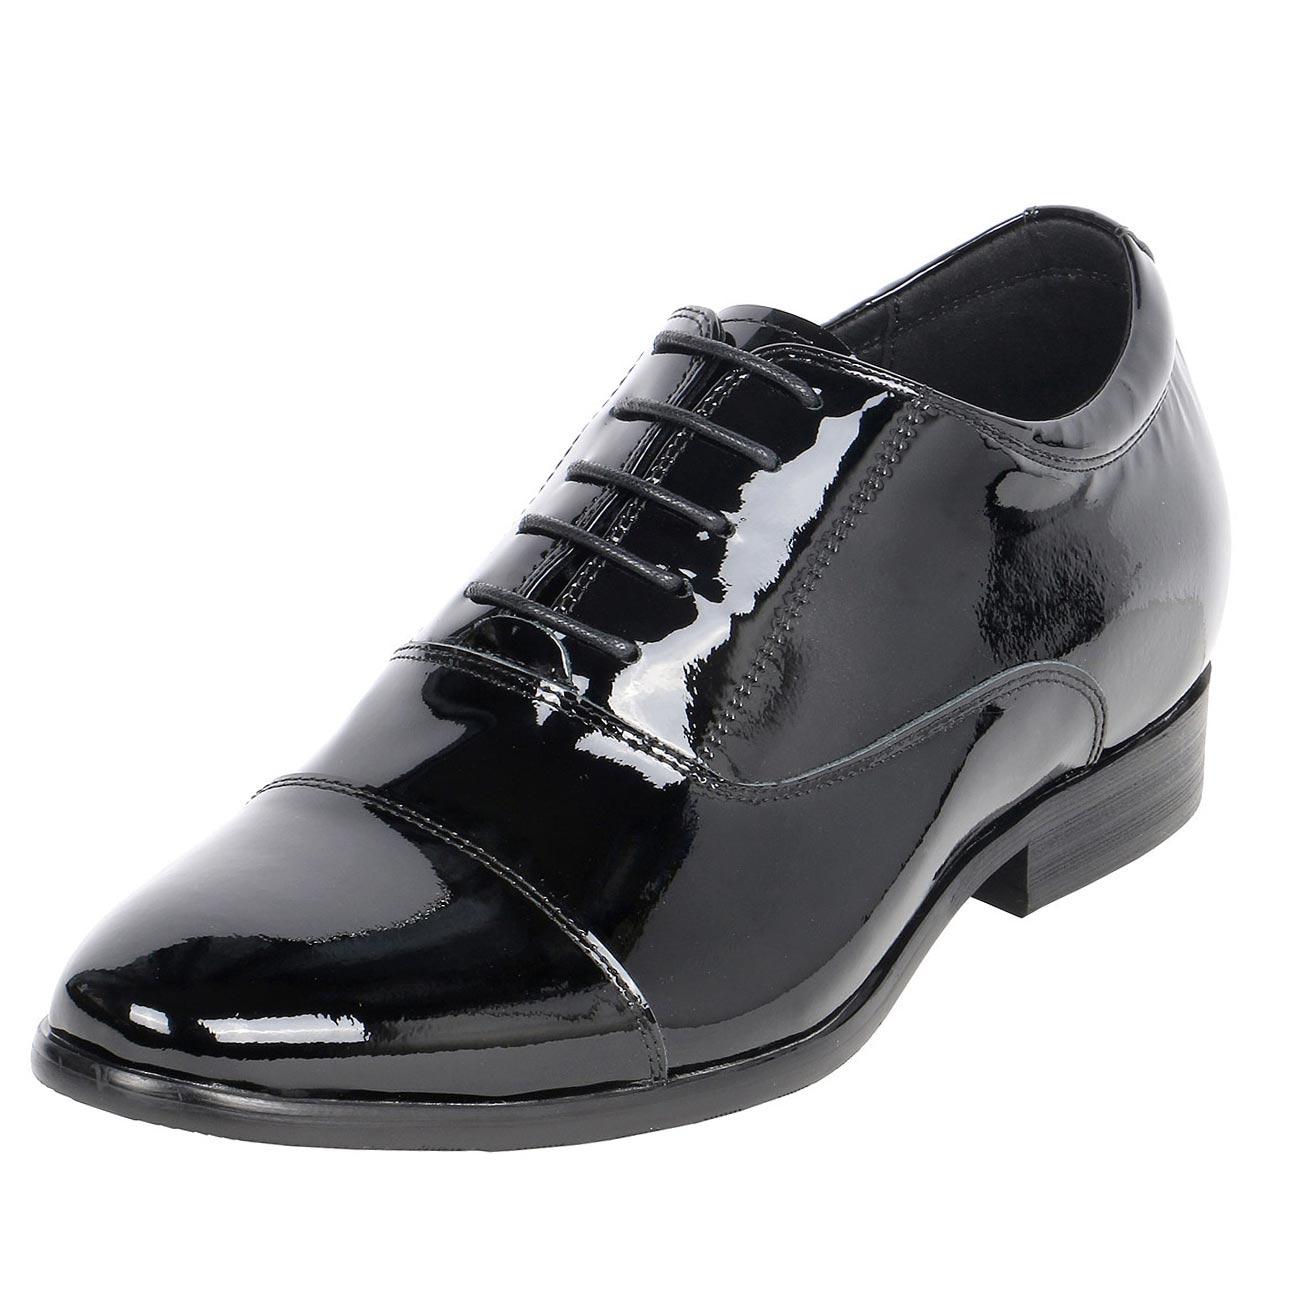 Patent Leather Built Up Formal Gentlemen Shoe 3